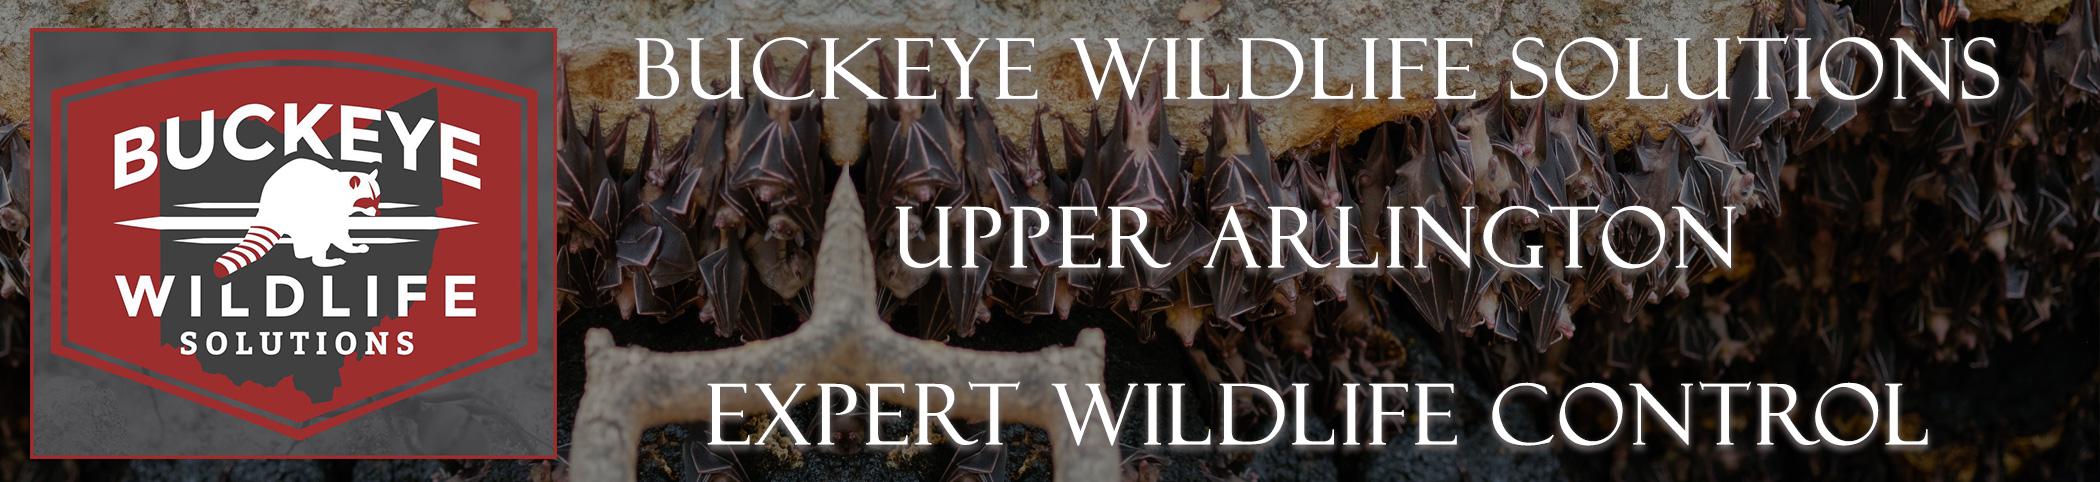 Upper-Arlington-buckeye-wildlife-solutions-ohio-header-image